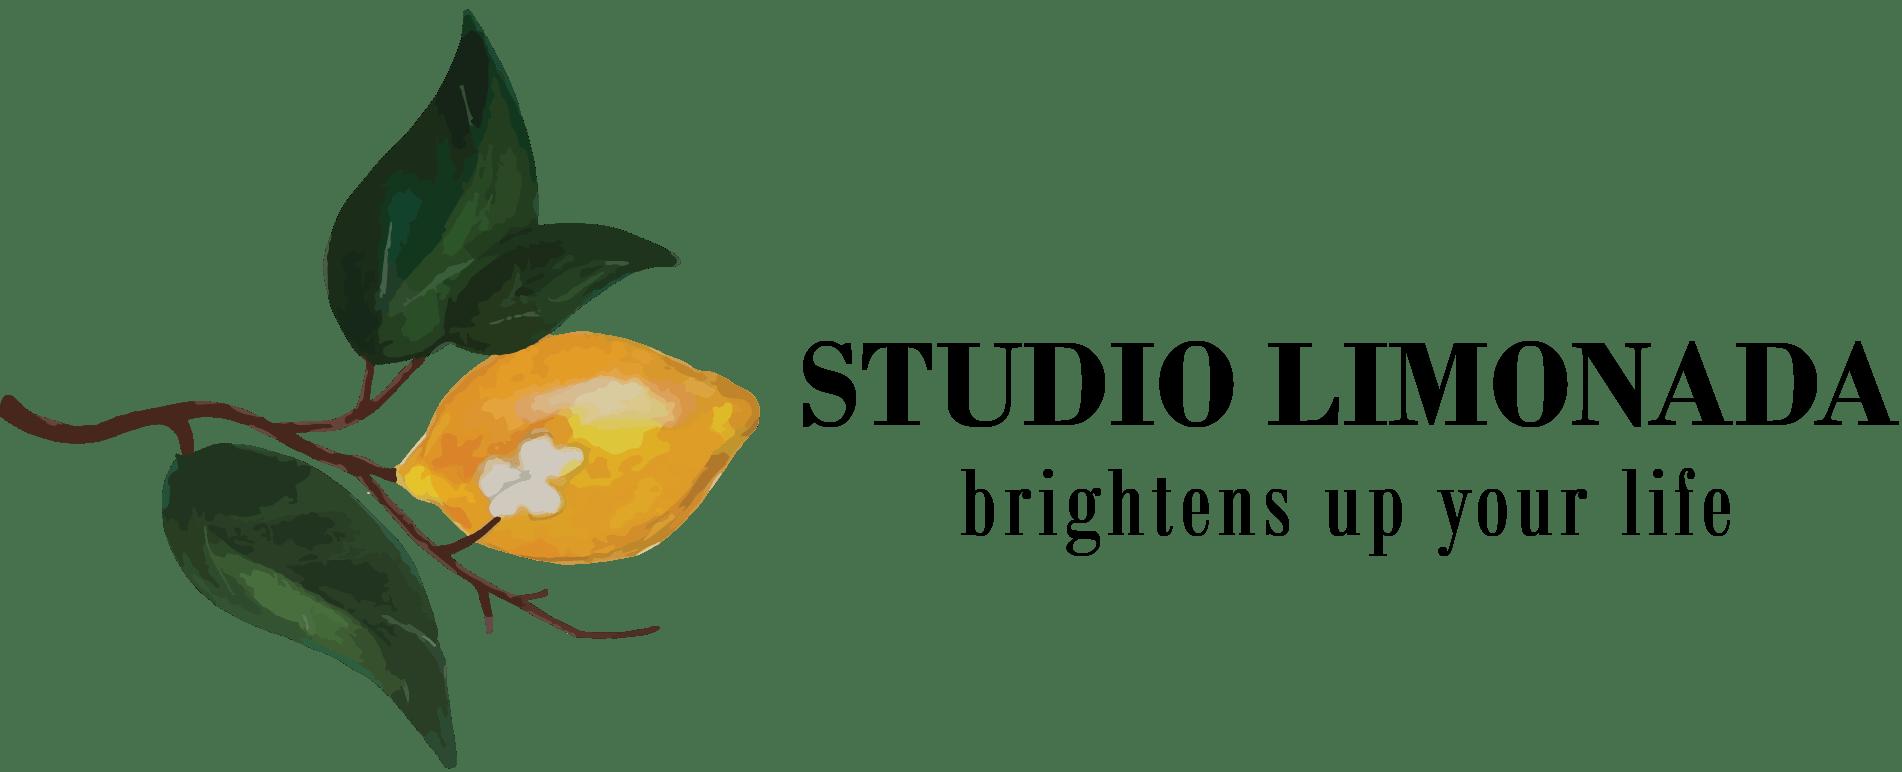 Studio Limonada